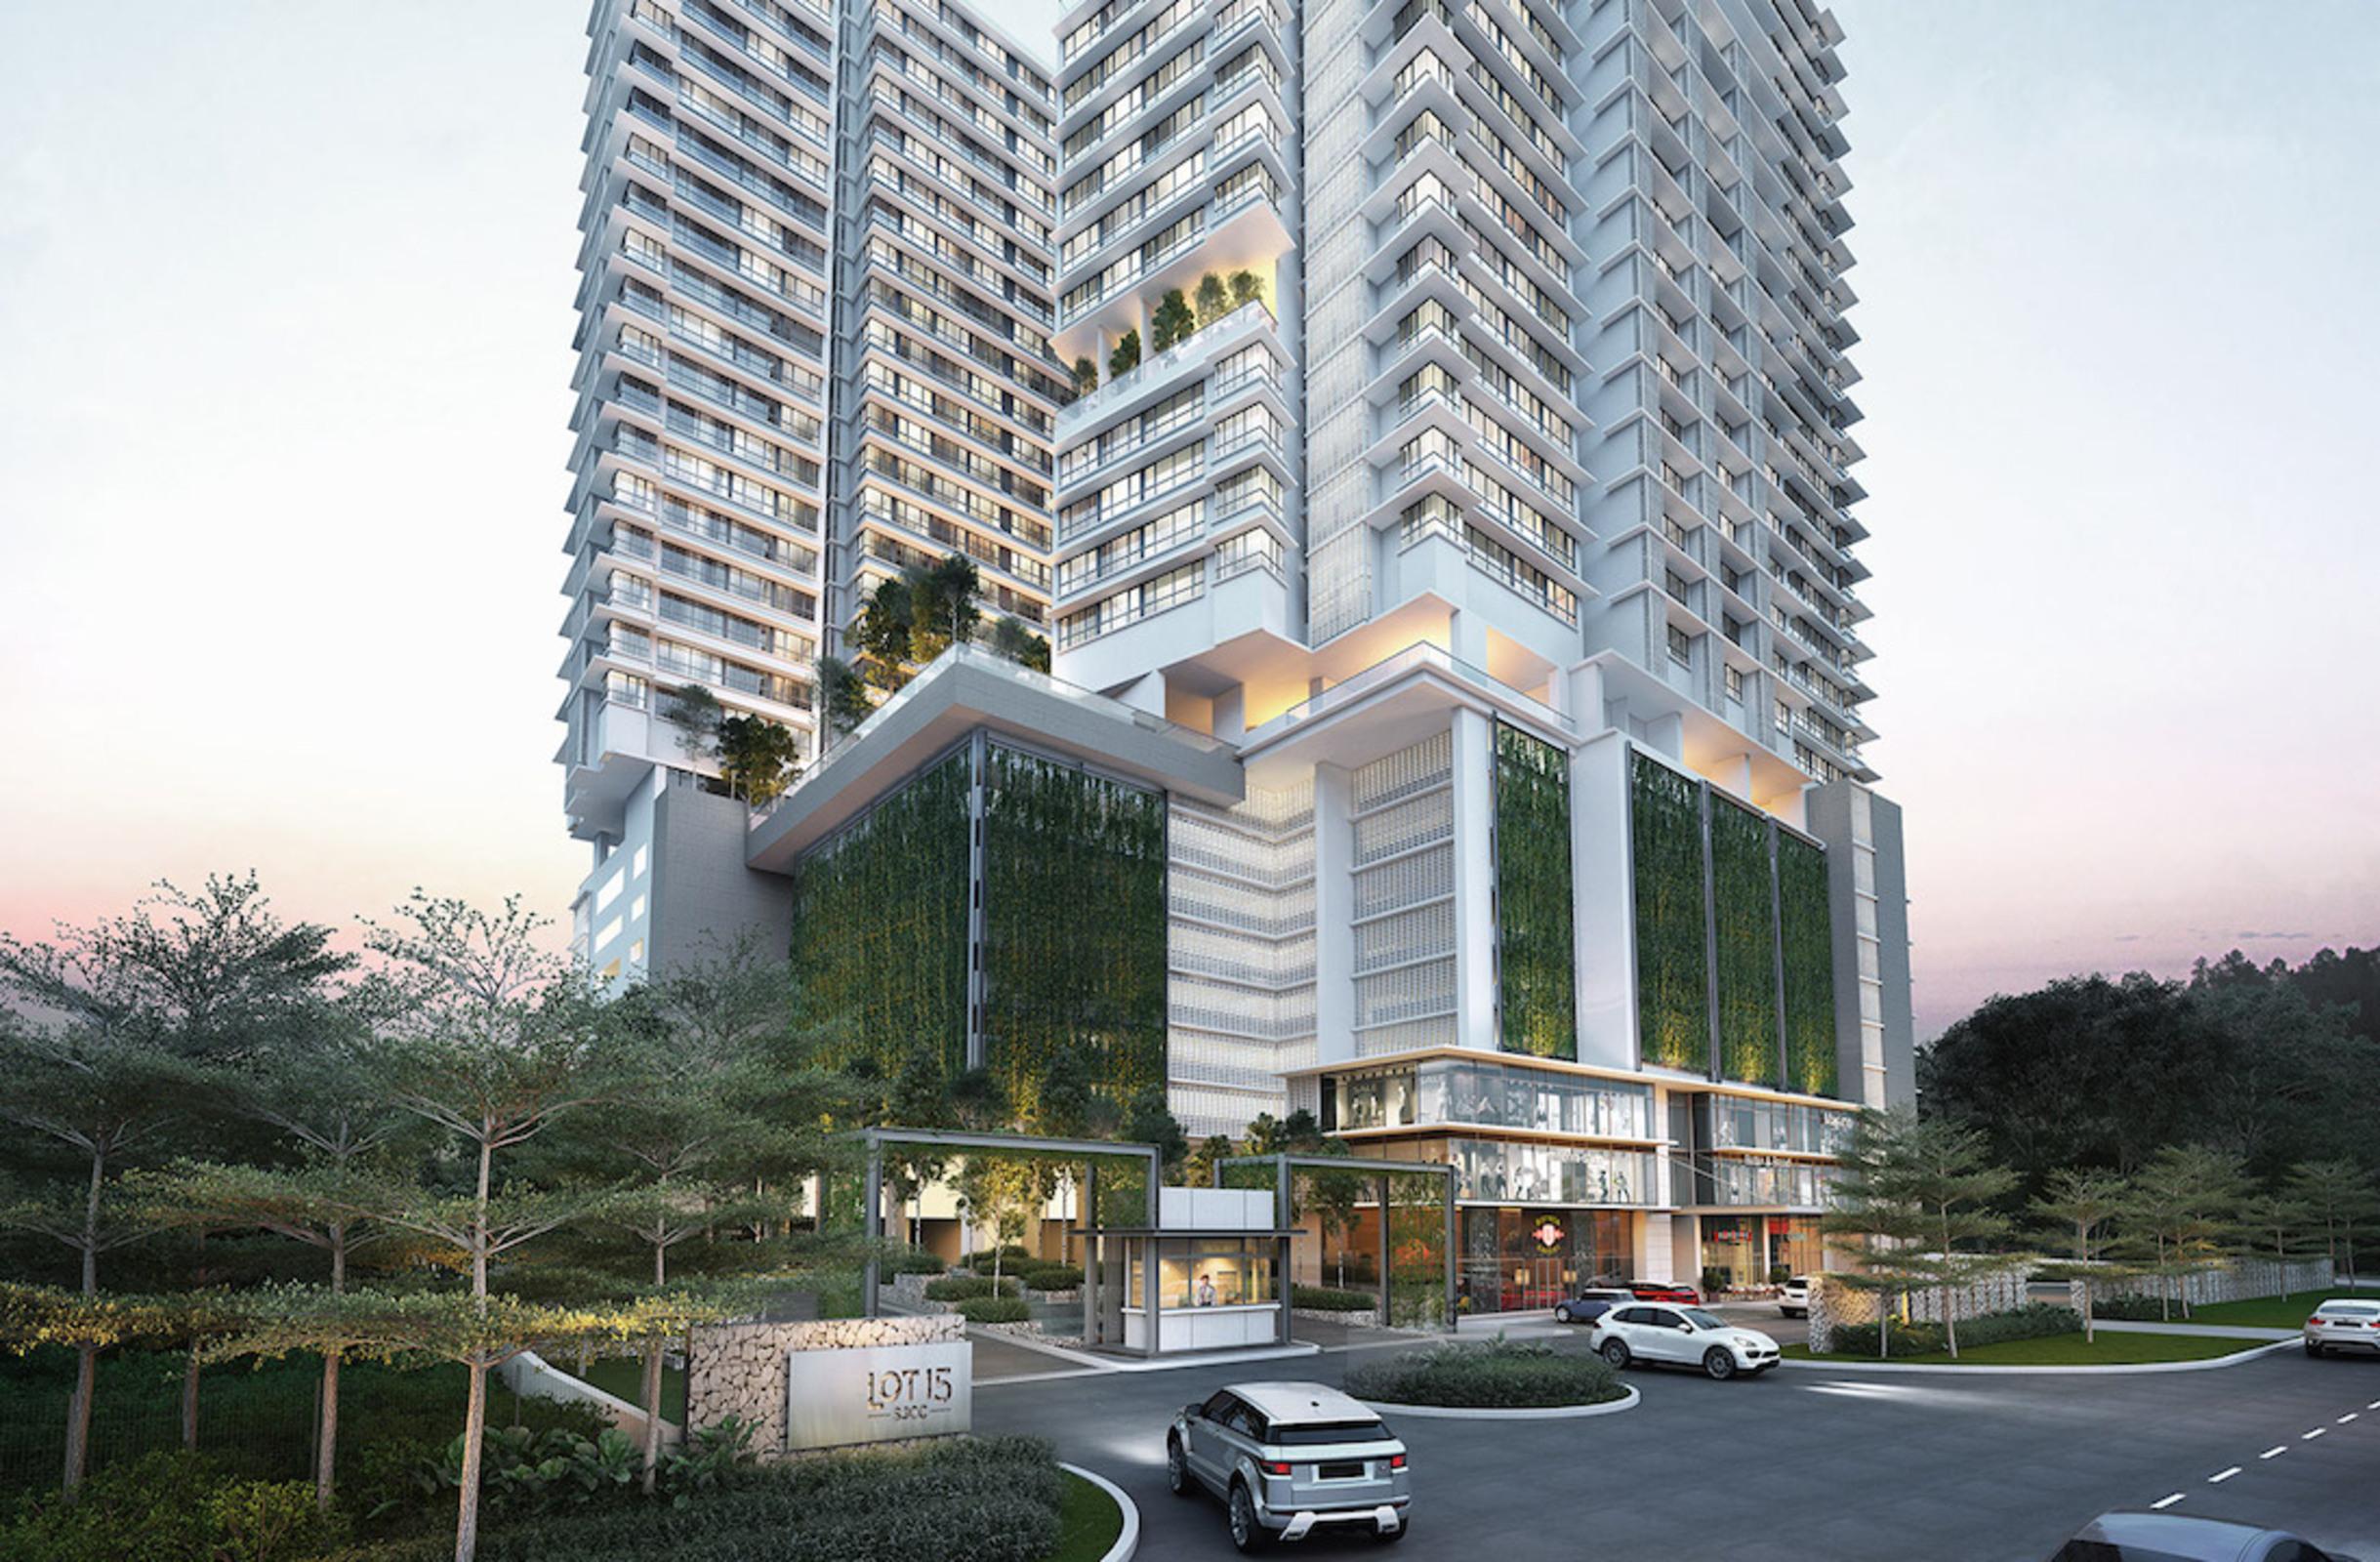 Subang jaya house for sale lot 15 3